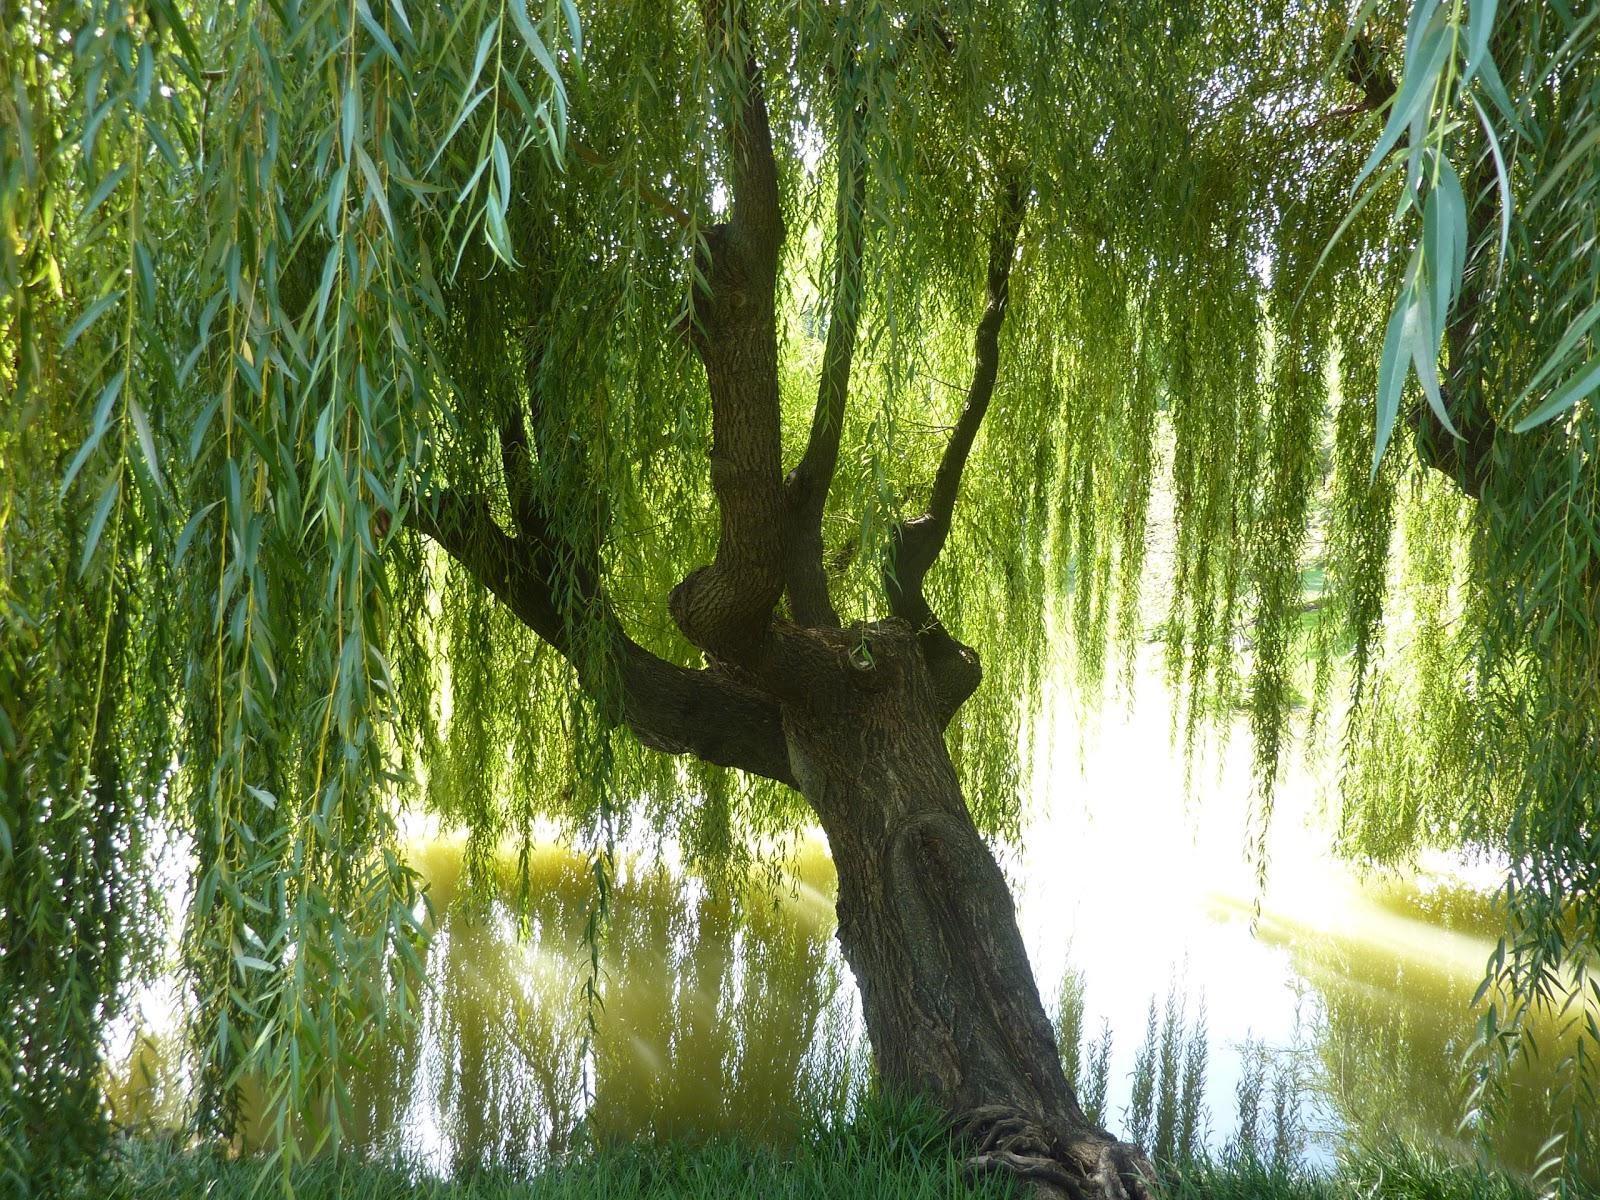 Garden Of Reflection August 2012